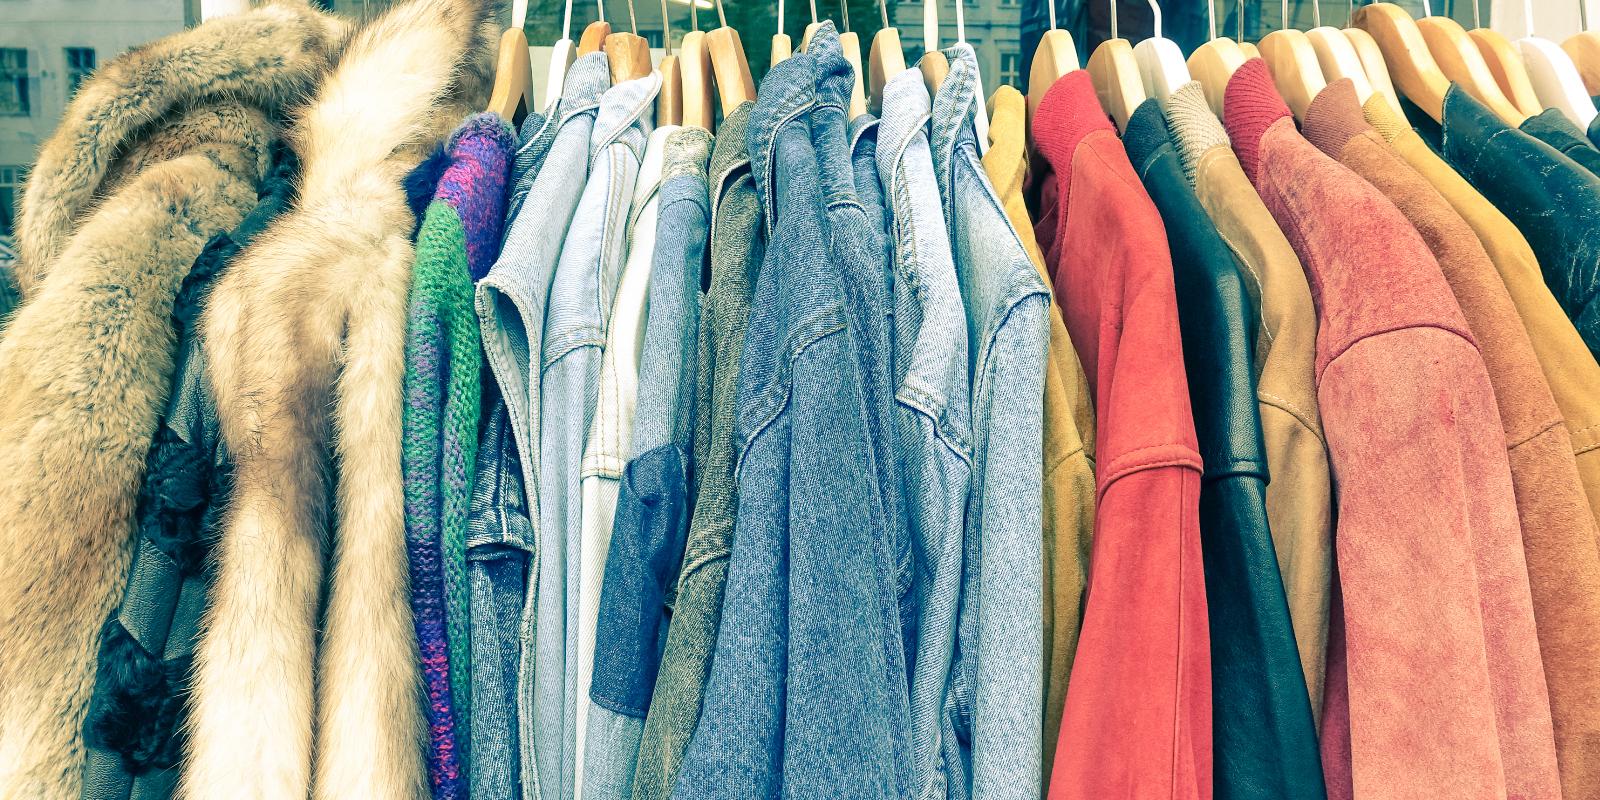 Vintage Clothing For Sale | Huddersfield - Queen Chi Vintage